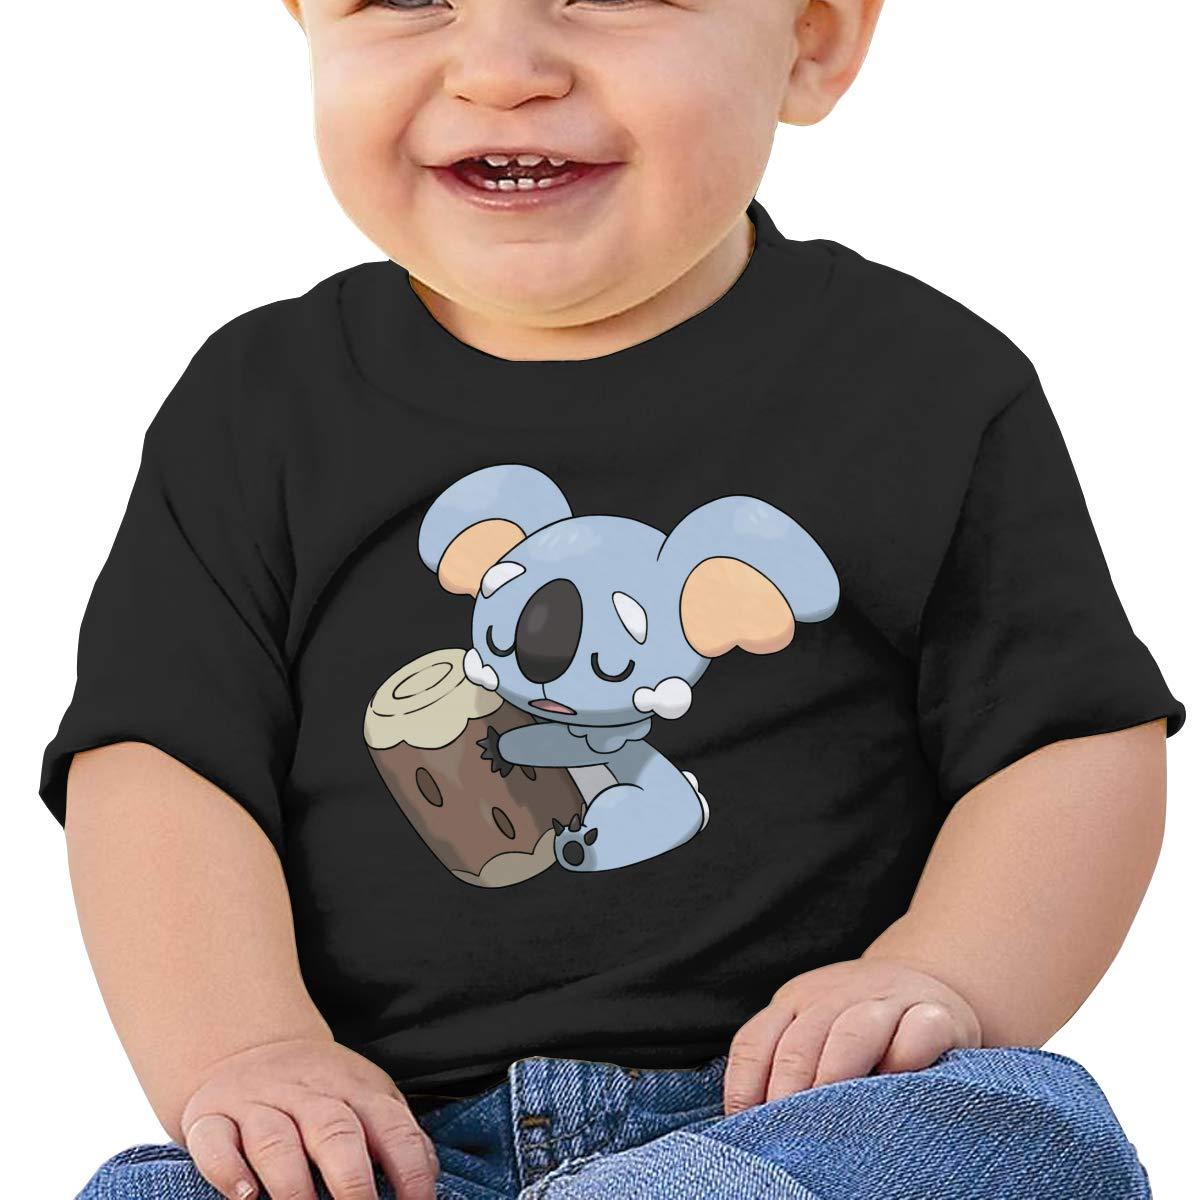 Ear-Koala Baby T-Shirt Infant Boy Girl Cotton T Shirts Soft Tee Shirts for 6M-2T Baby